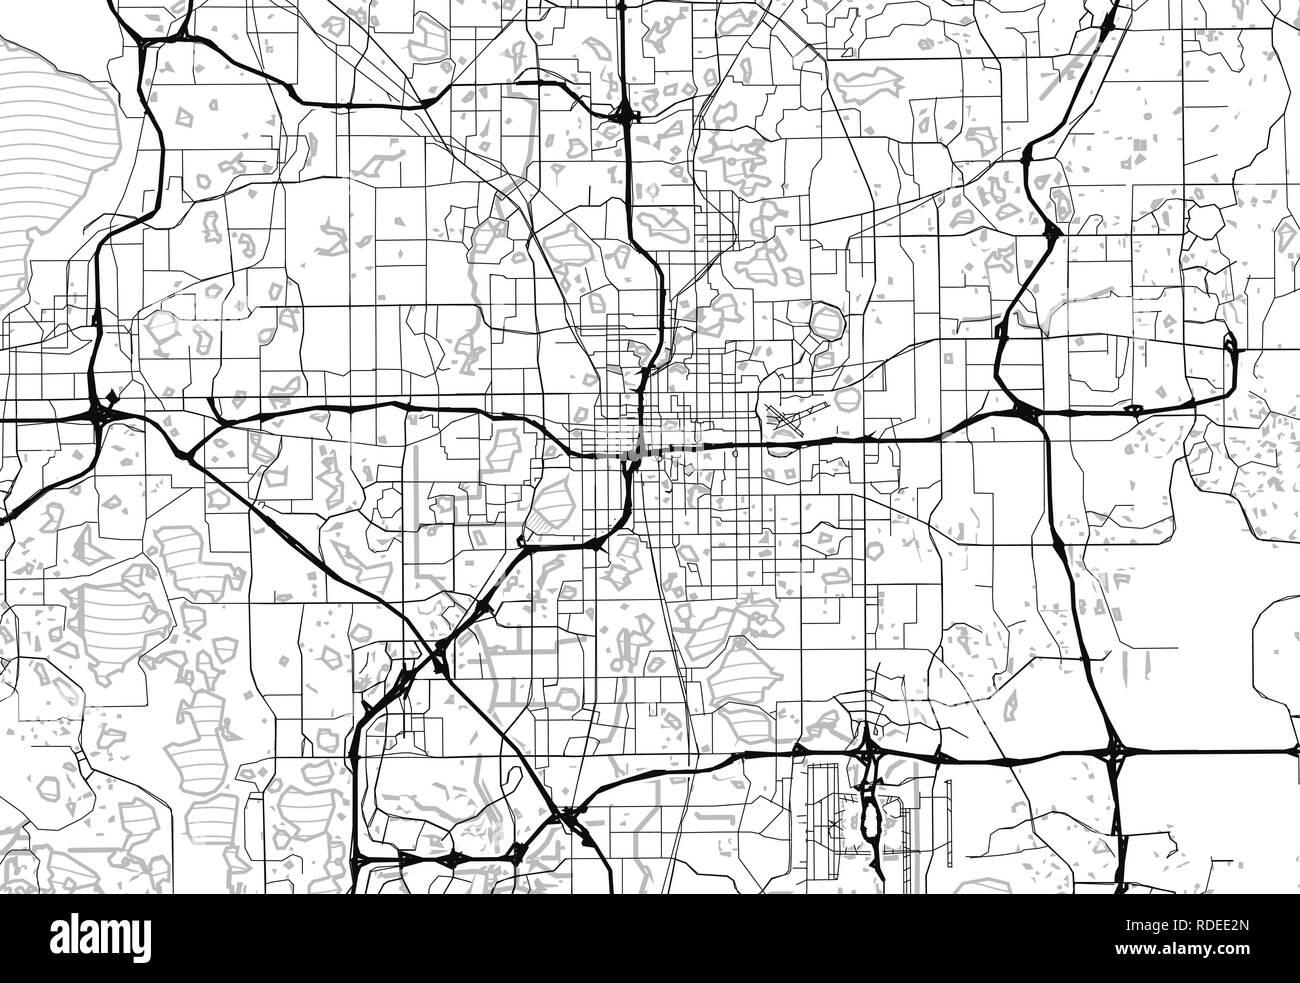 Orlando Florida On Us Map.Geography Travel Usa Florida Orlando Stock Photos Geography Travel